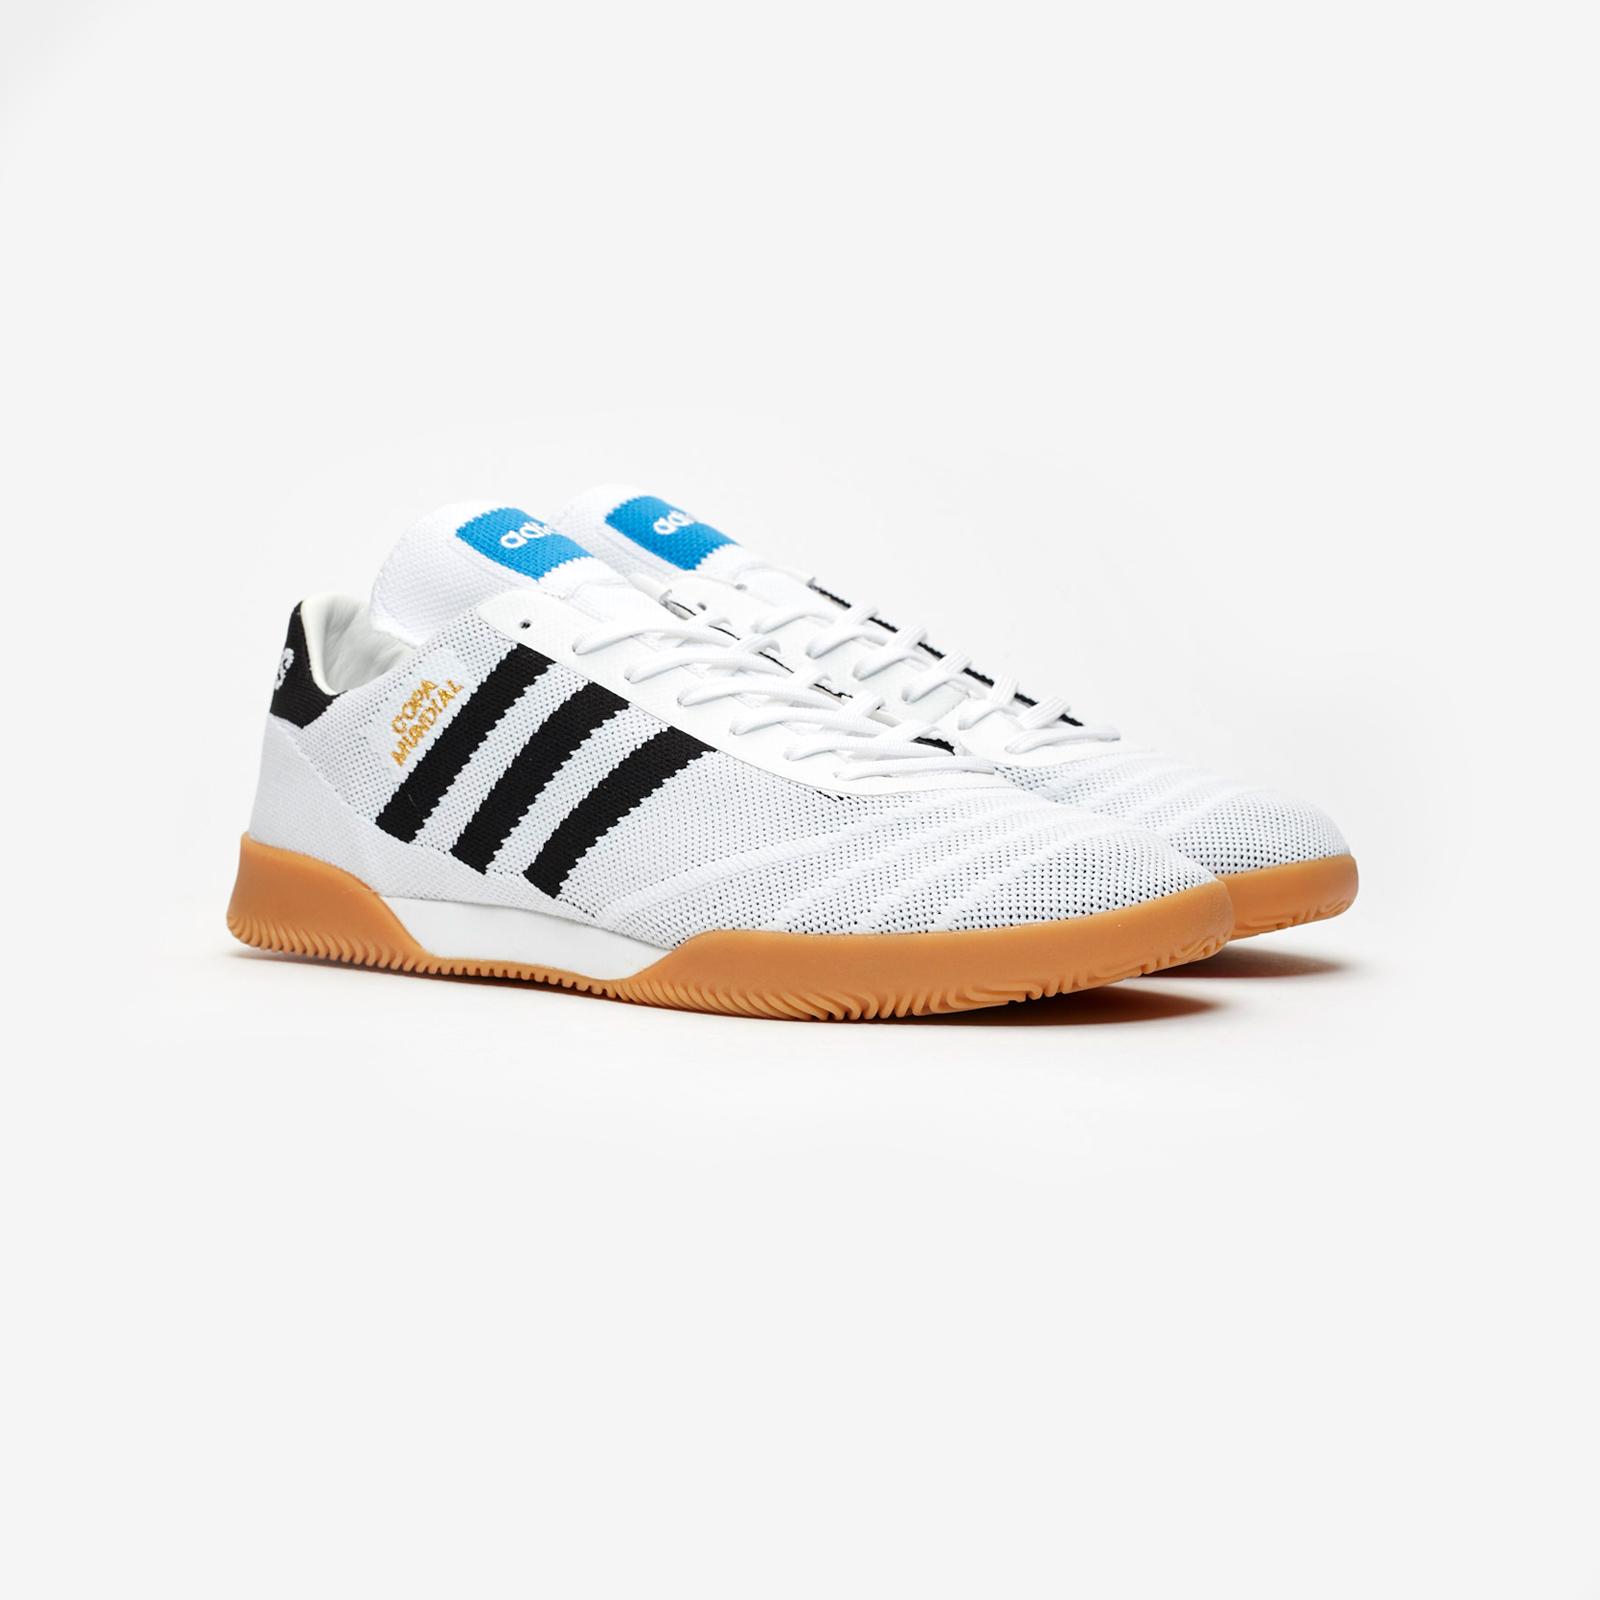 low priced 684f6 c30a4 Sneakers G26308 Streetwear Tr Adidas 70y Sneakersnstuff Copa amp  nCWFnqxf7T